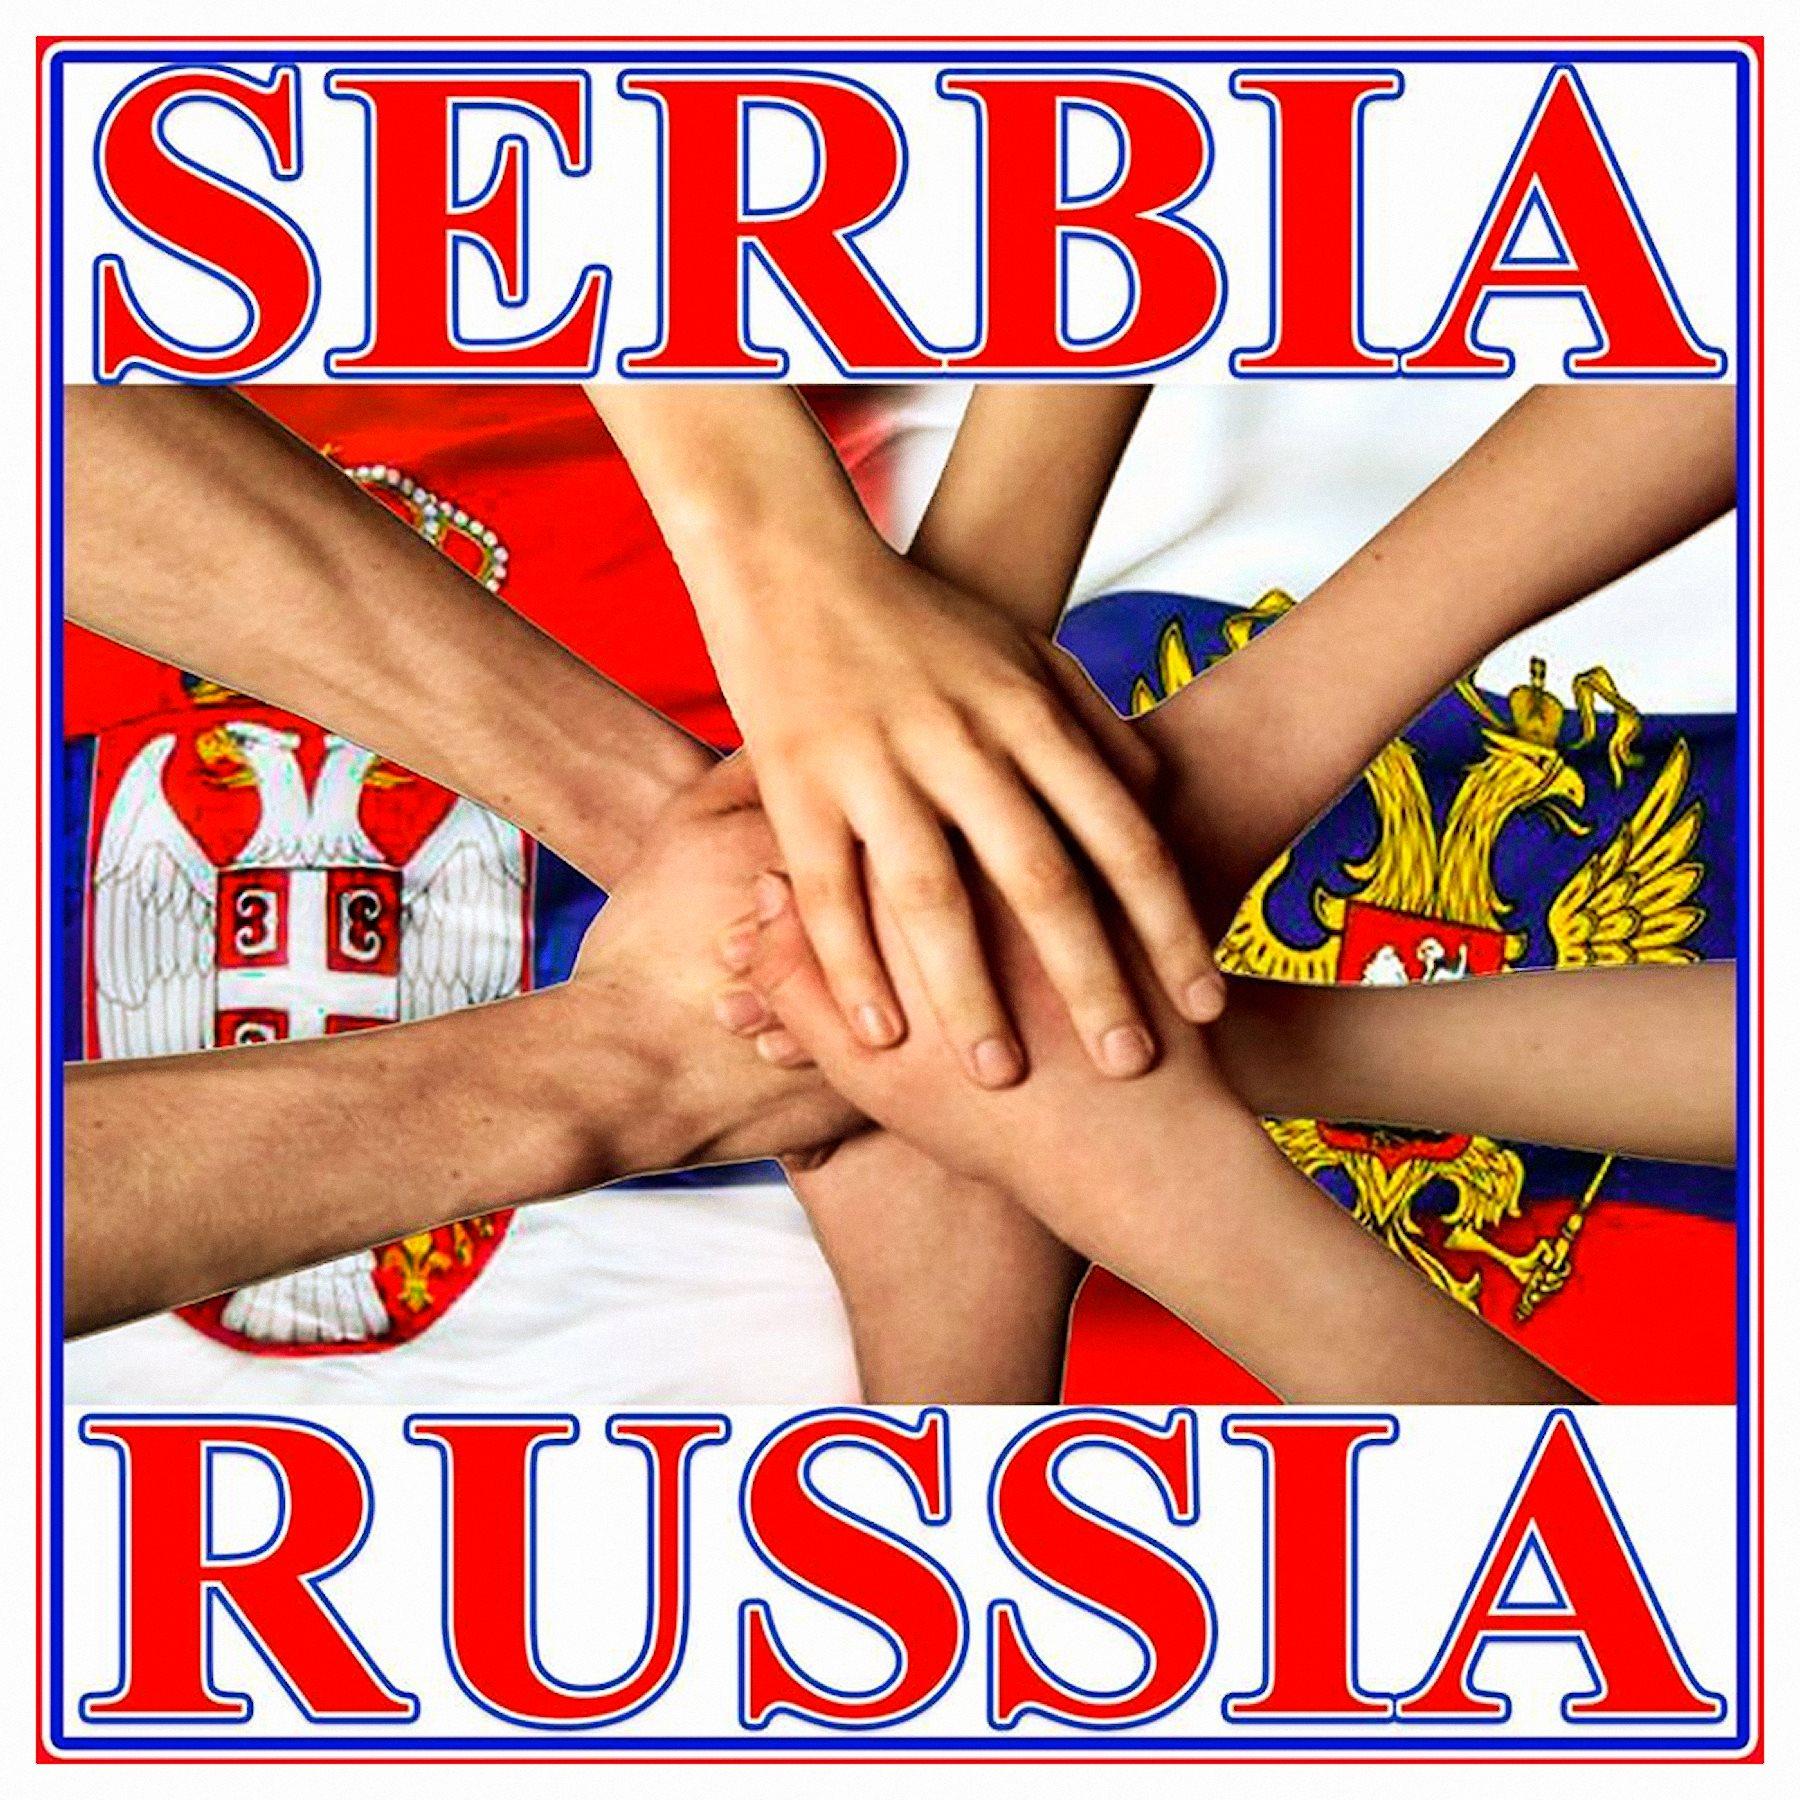 00 serbia russia. 200715